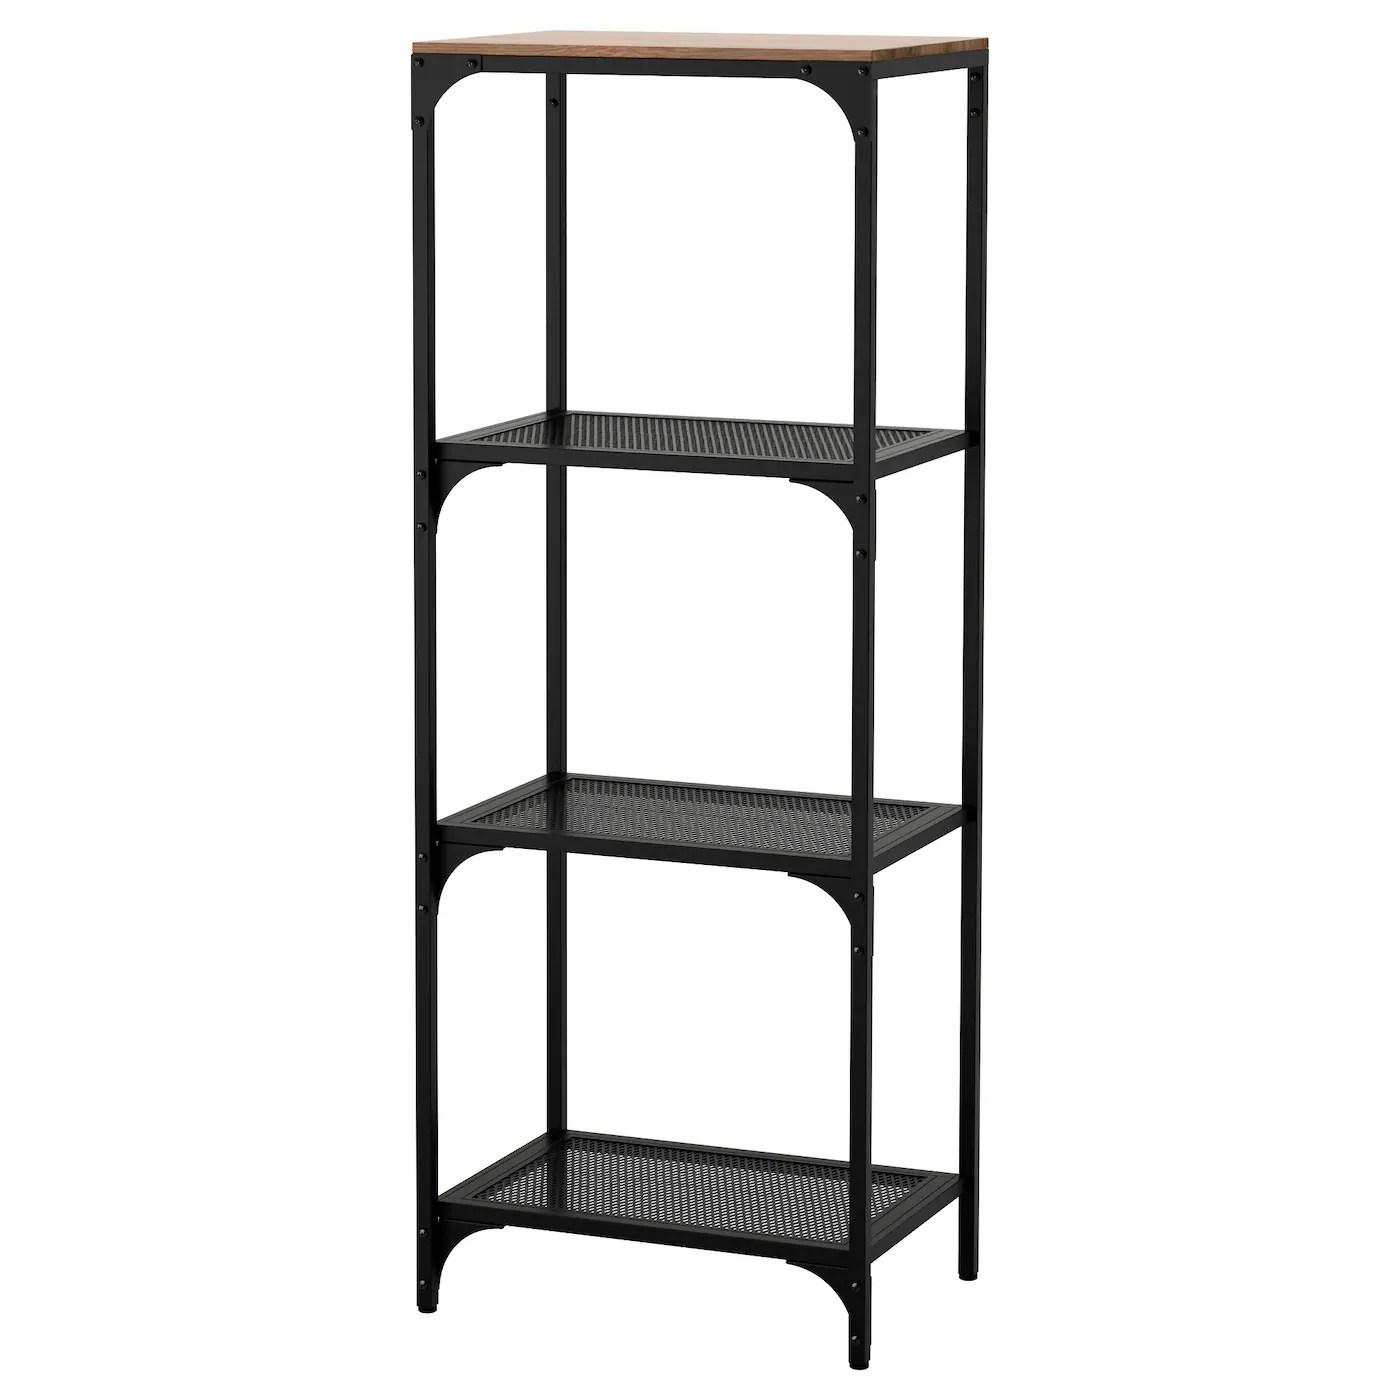 fjallbo shelf unit black 20 1 8x53 1 2